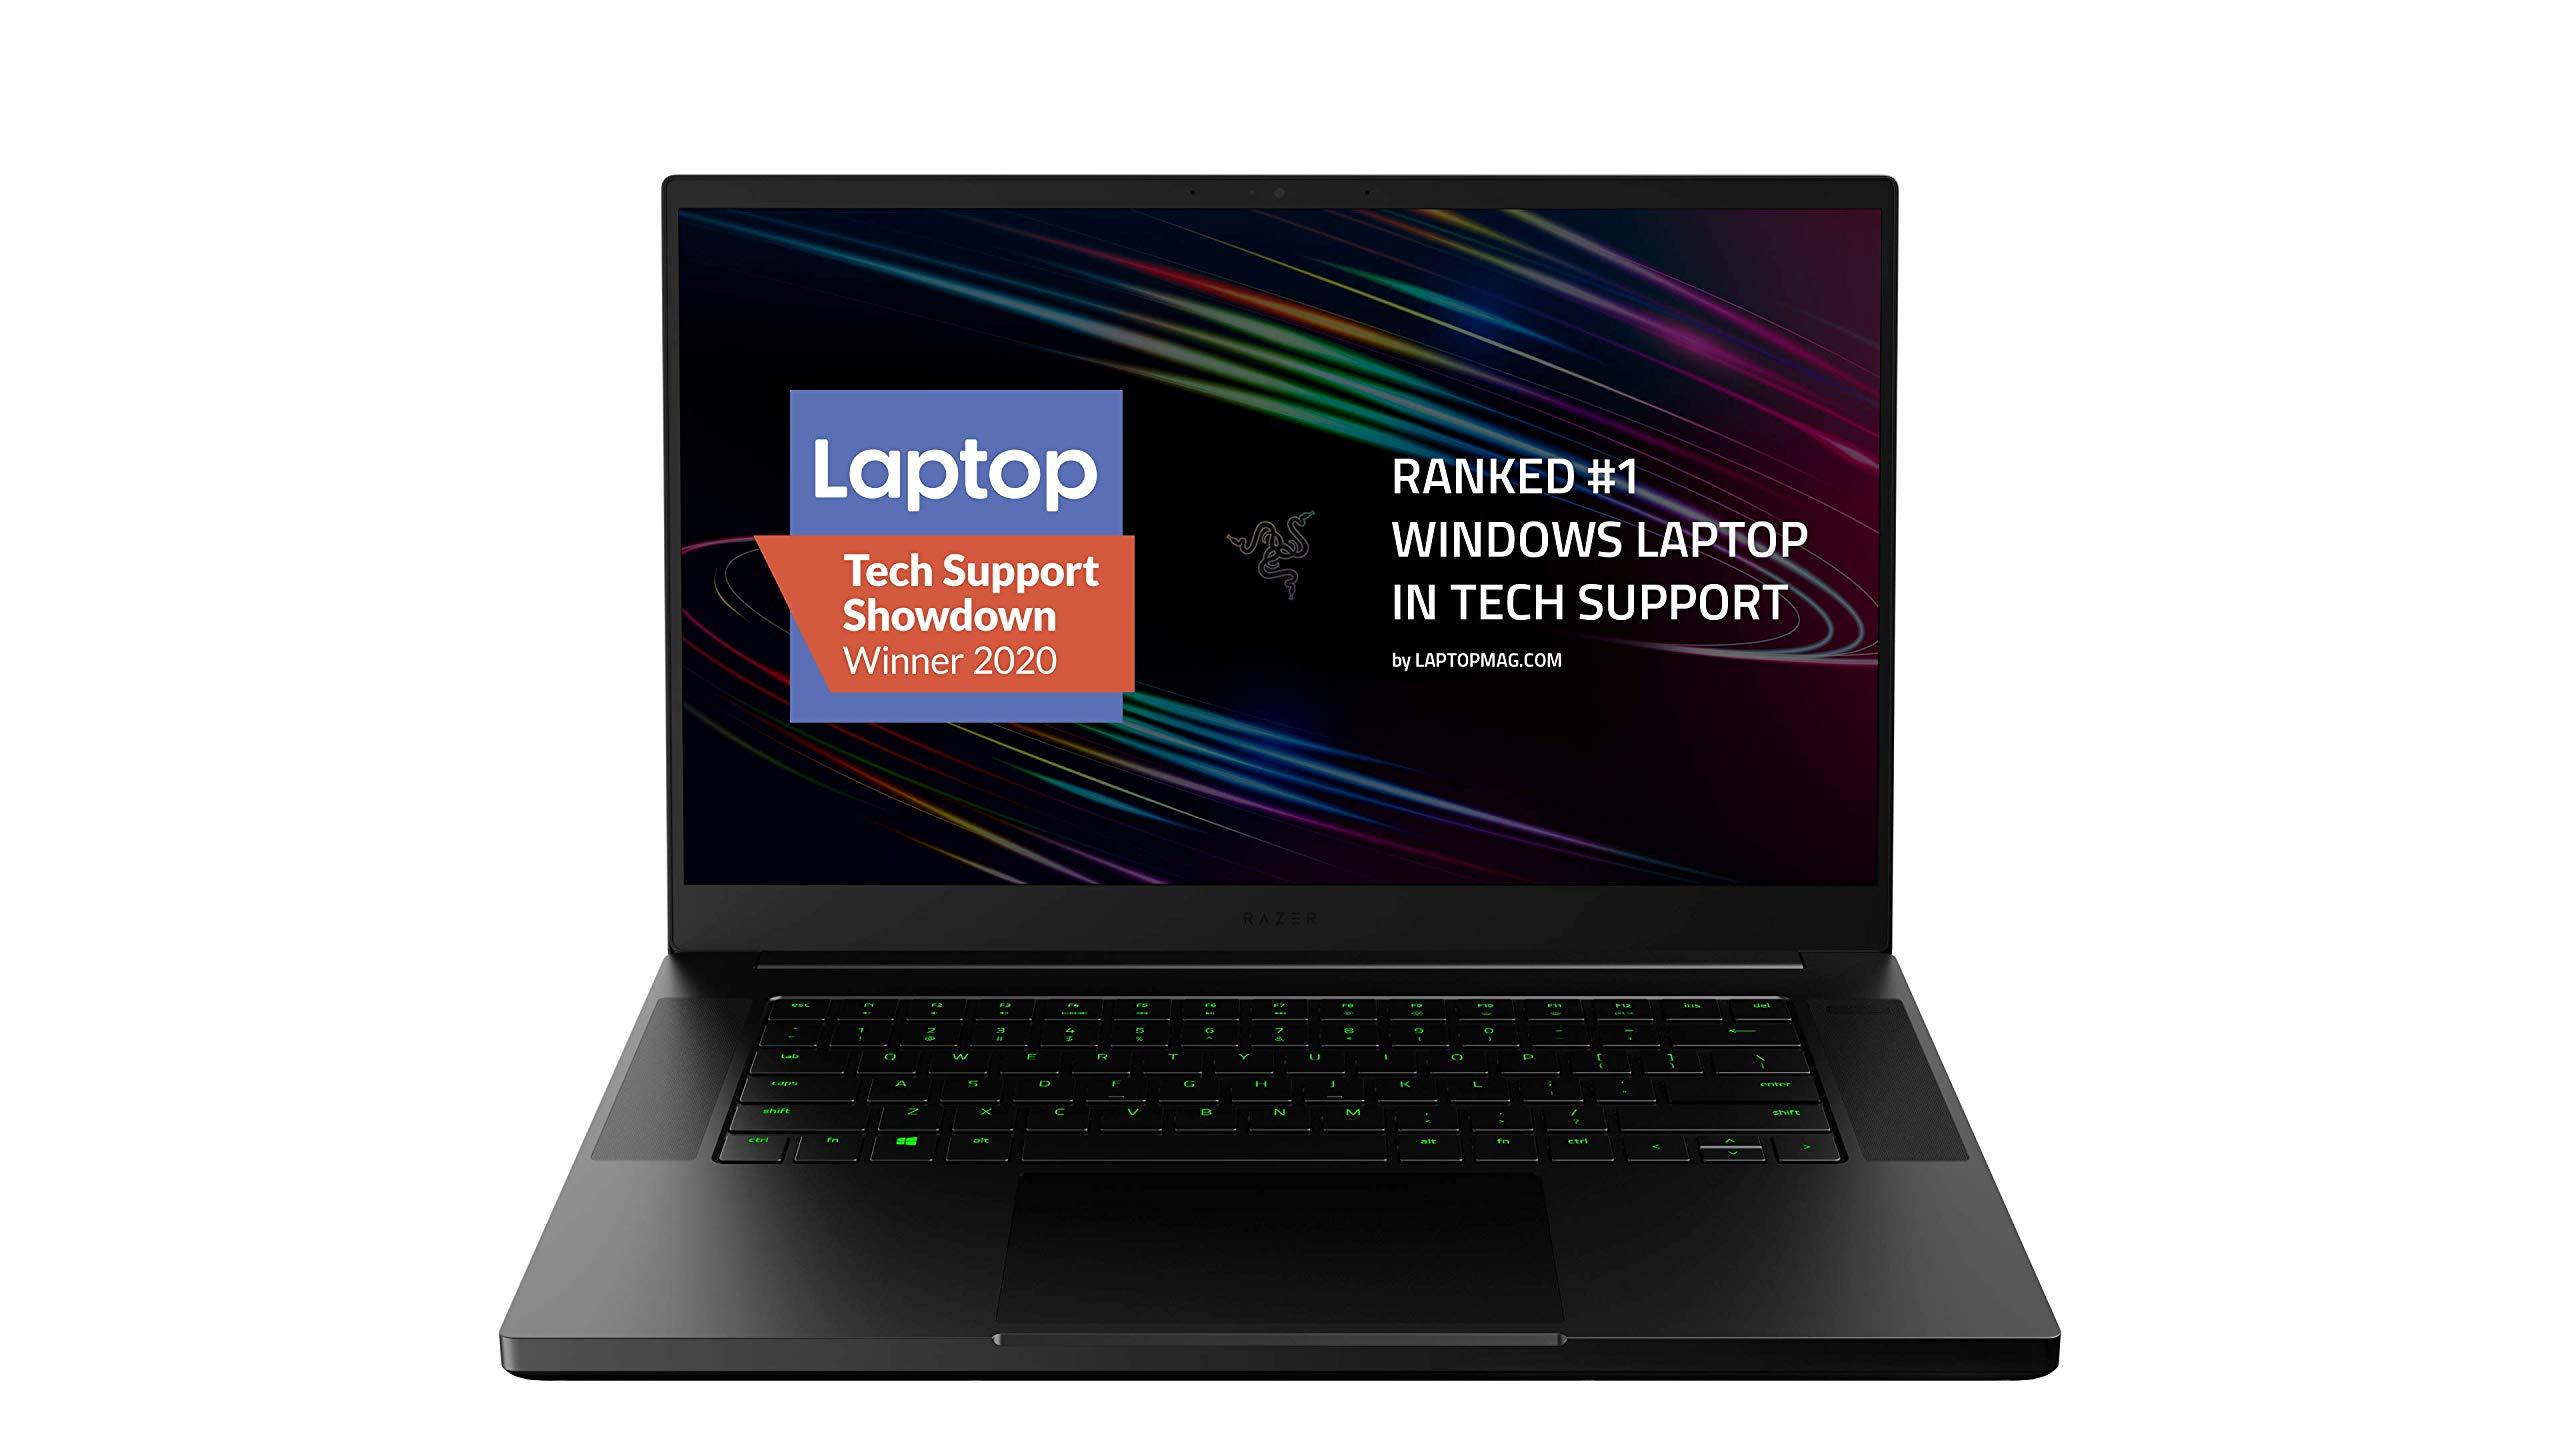 "Razer Blade 15 Base Gaming Laptop 2020: Intel Core i7-10750H 6 Core, NVIDIA GeForce RTX 2070 Max-Q, 15.6"" FHD 1080p 144Hz, 16GB RAM, 512GB SSD, CNC Aluminum, Chroma RGB Lighting, Thunderbolt 3, Black"